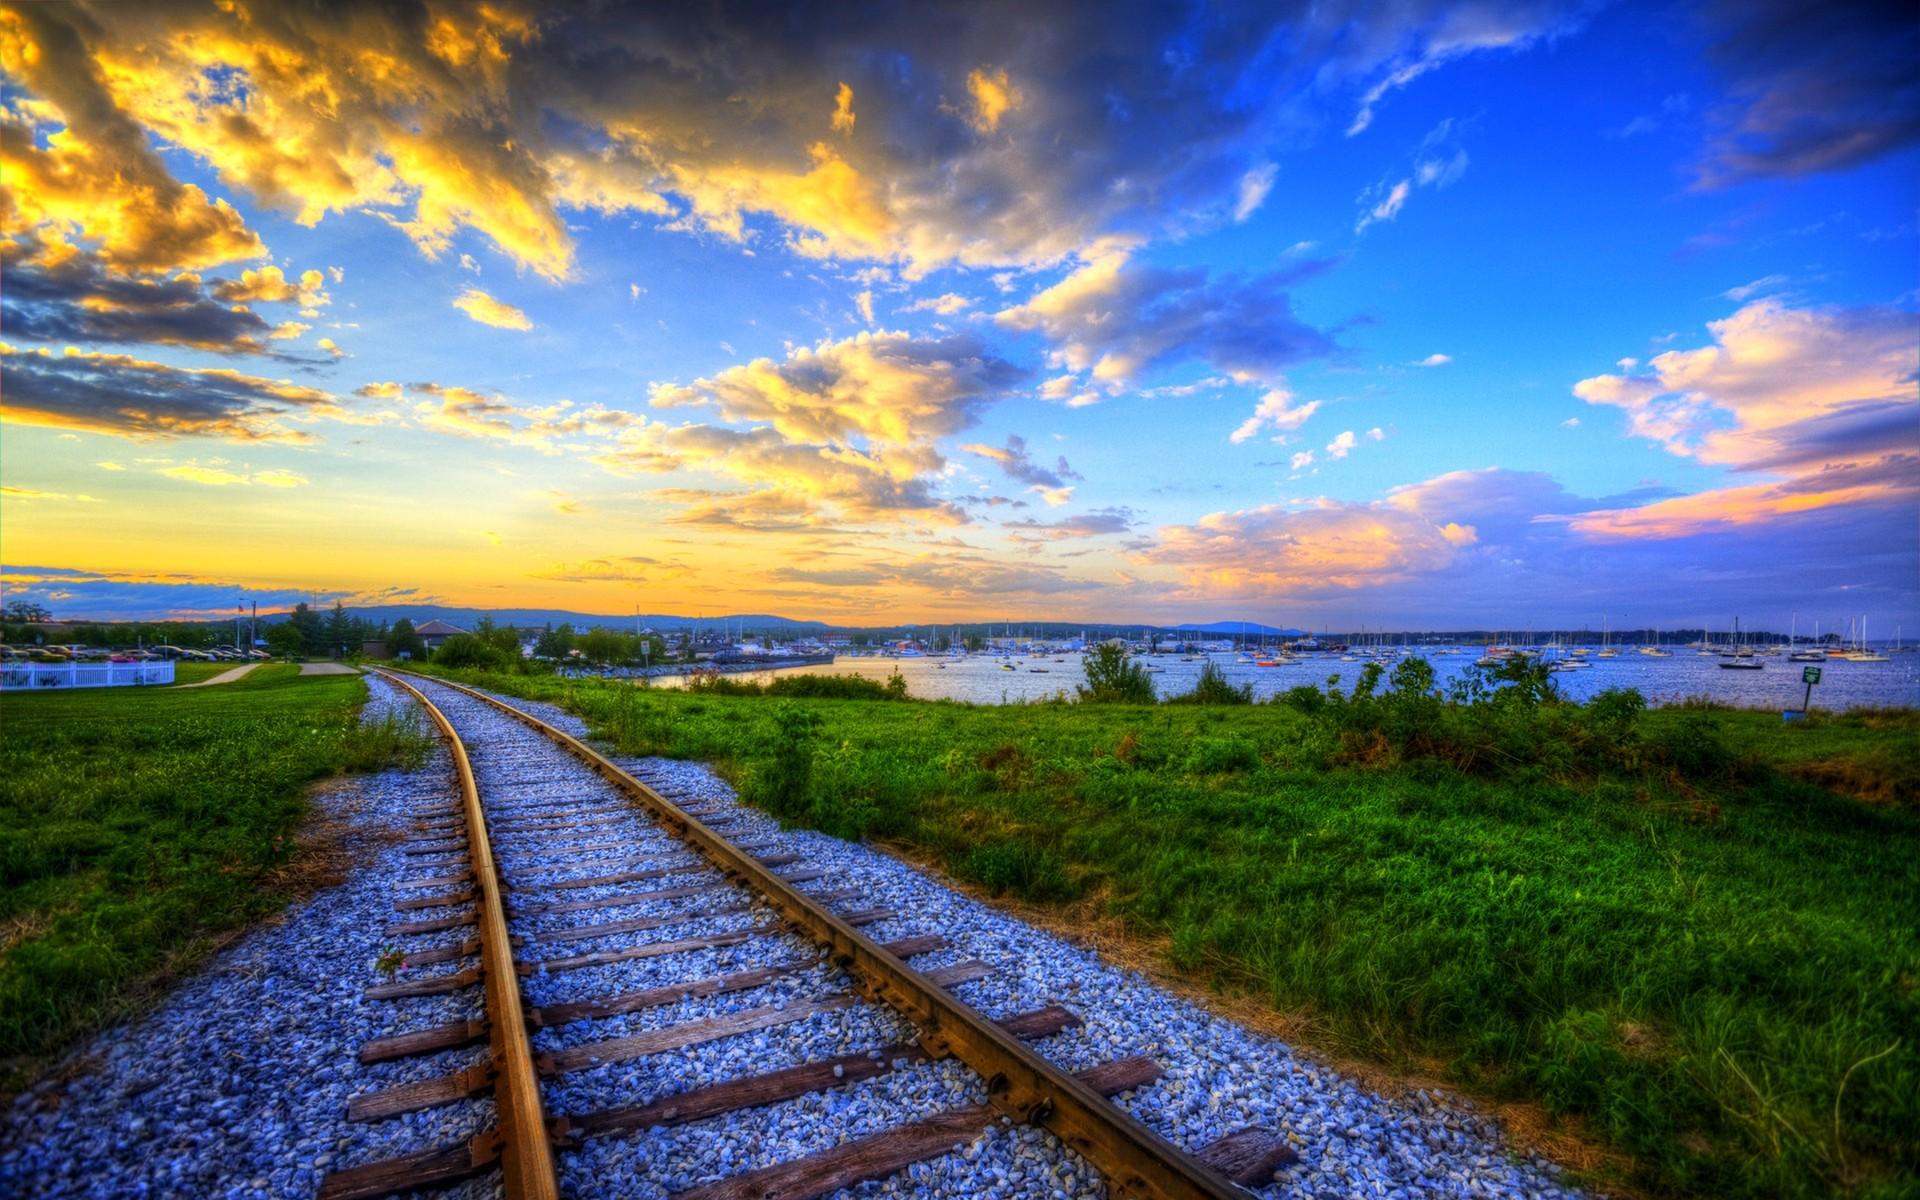 Train Track Wallpaper HD 37974